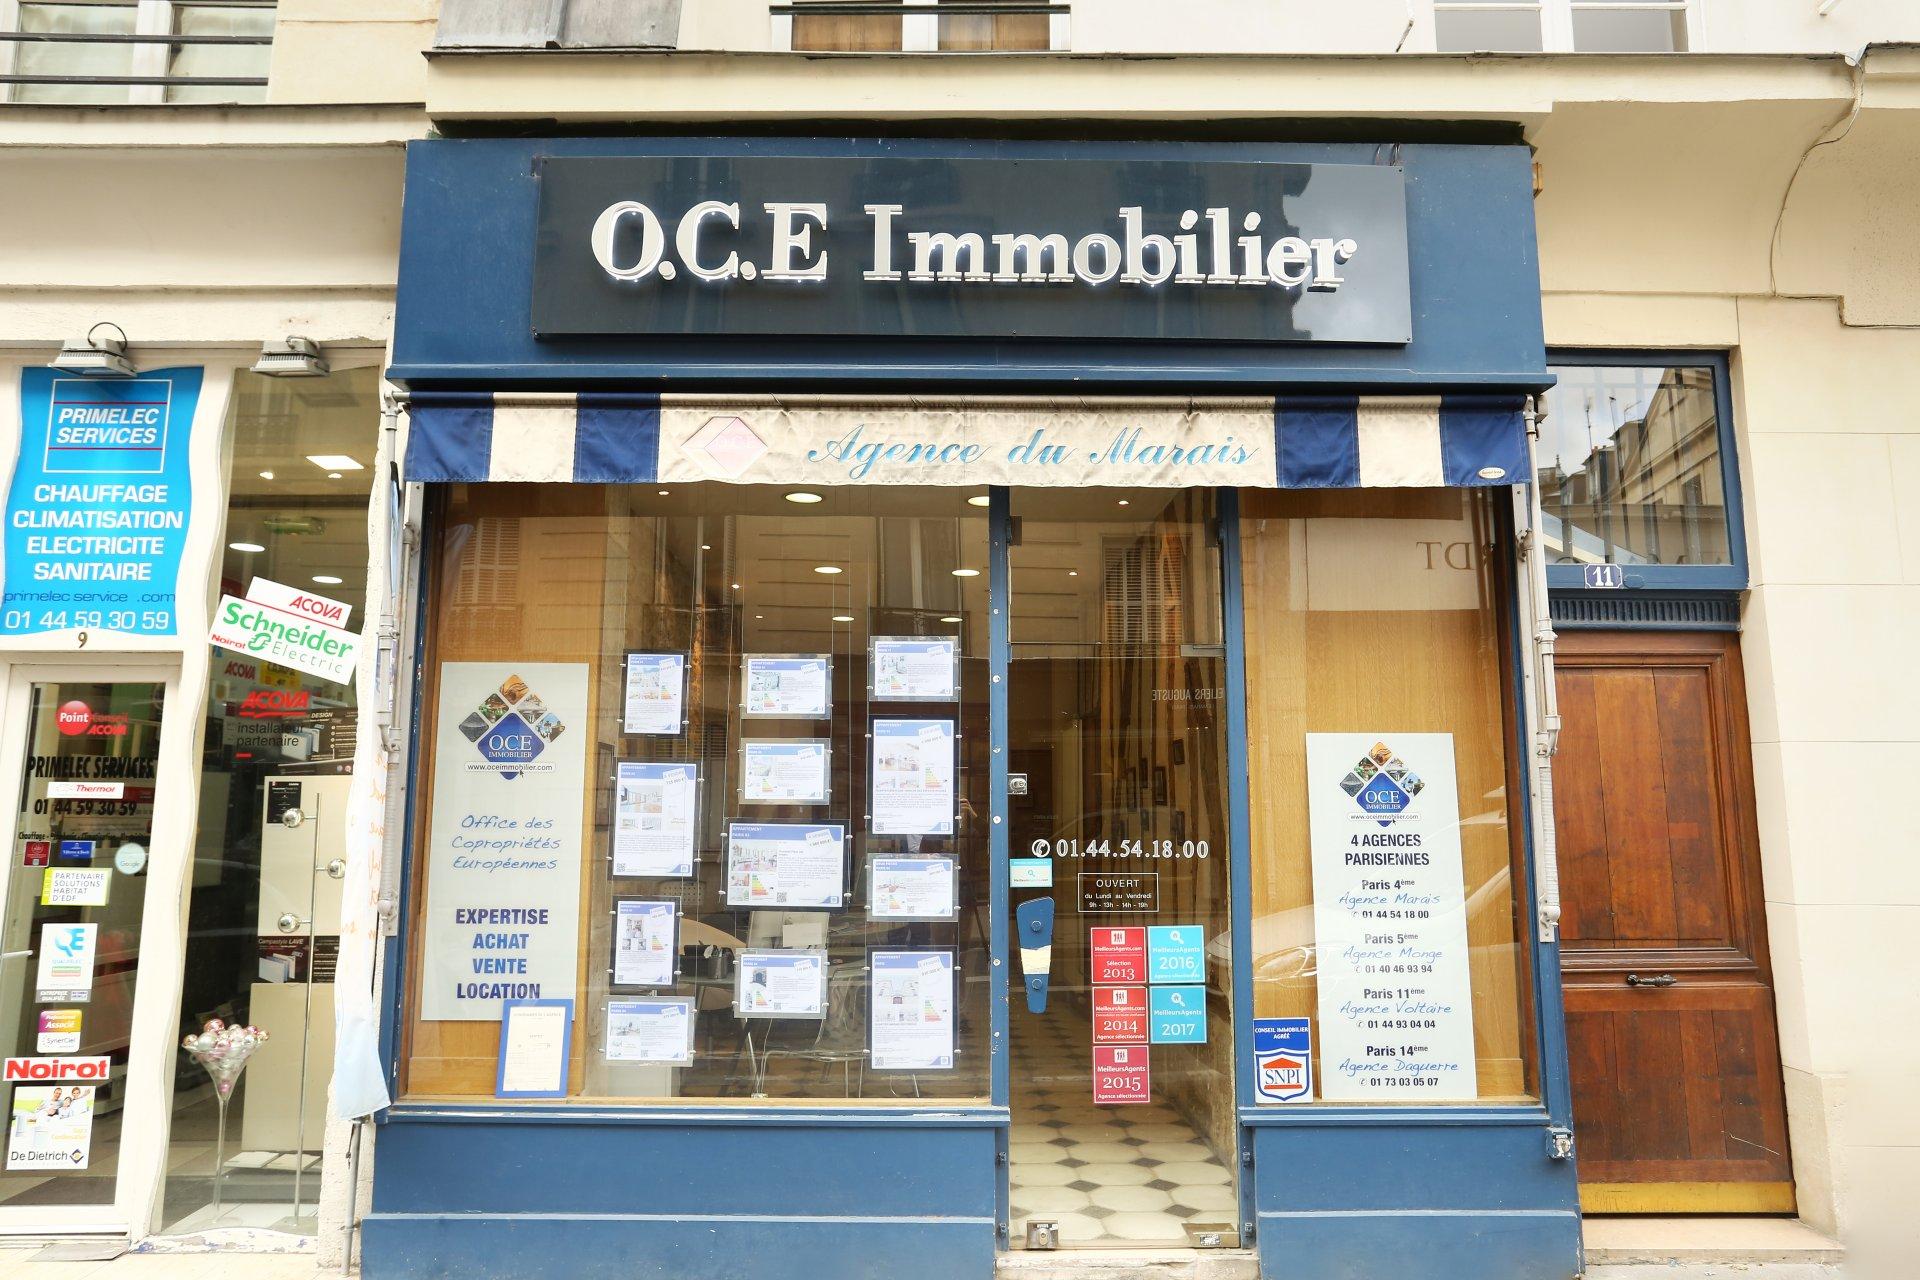 OCE Turenne